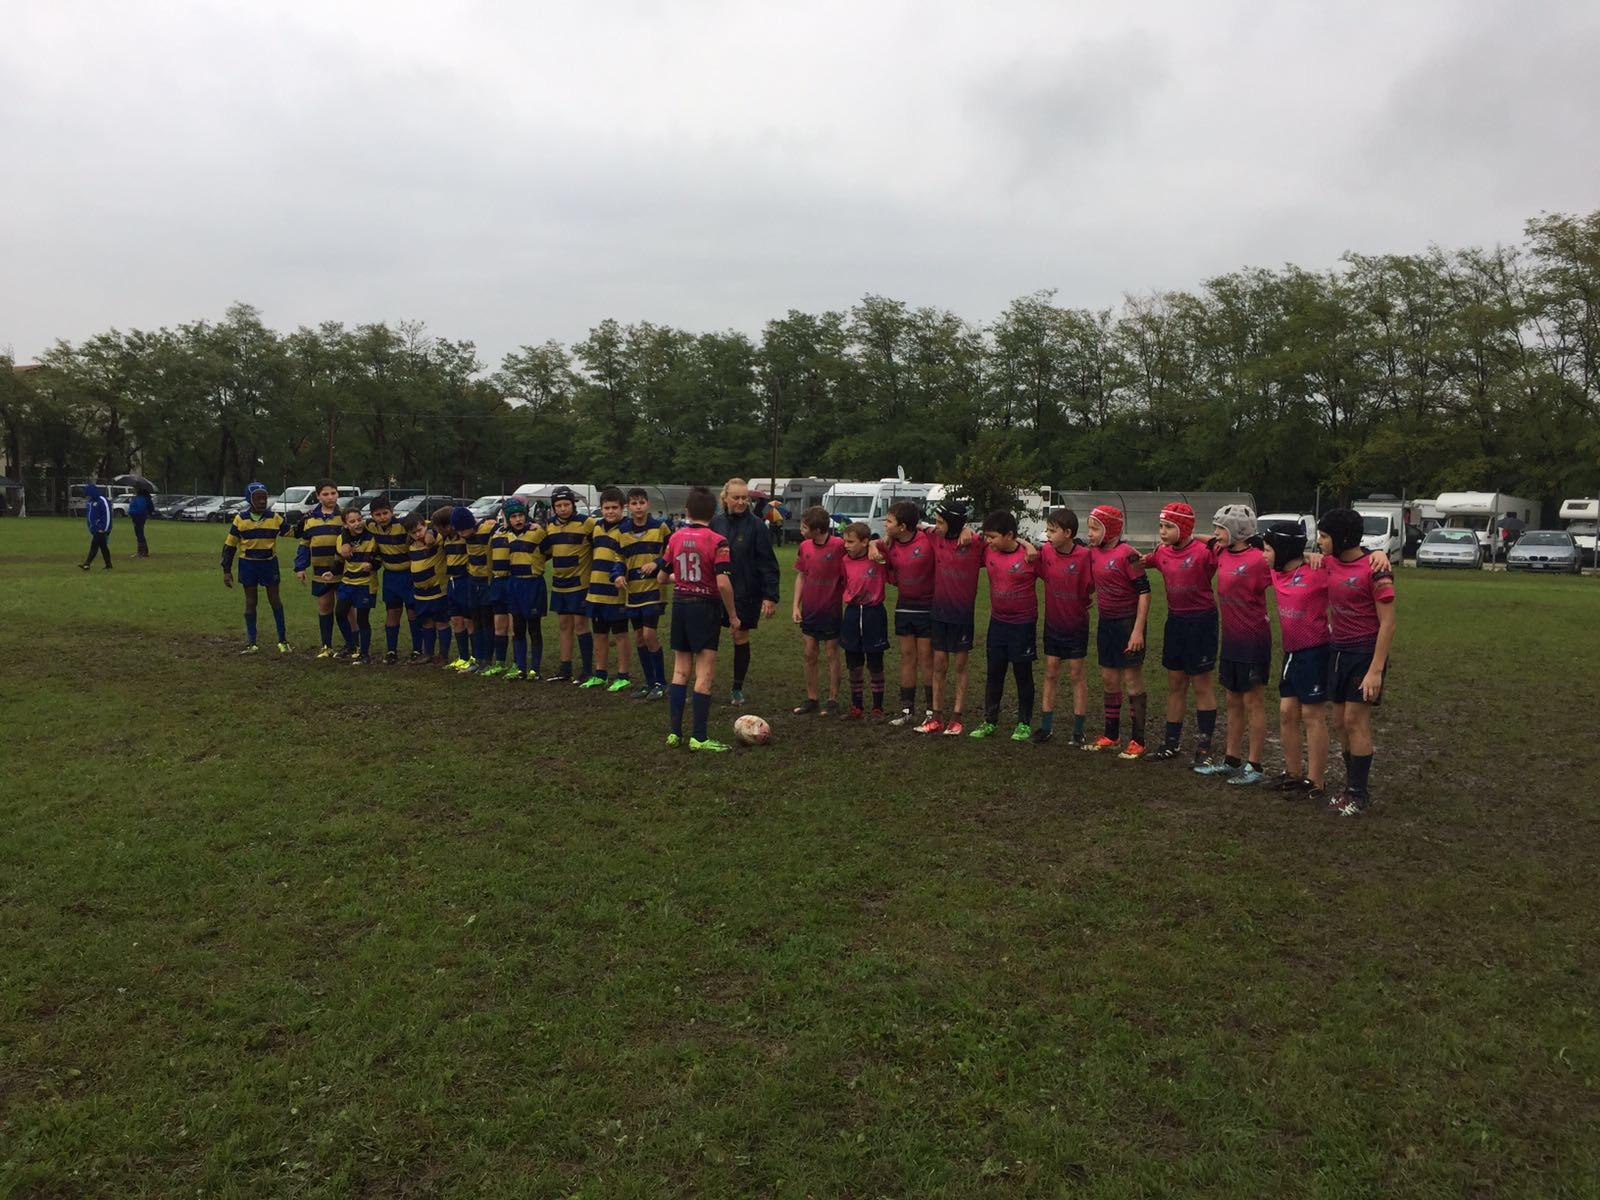 Vittorio Veneto 0 Vs 1 Stade Rugby Club Wien 24 September 2017